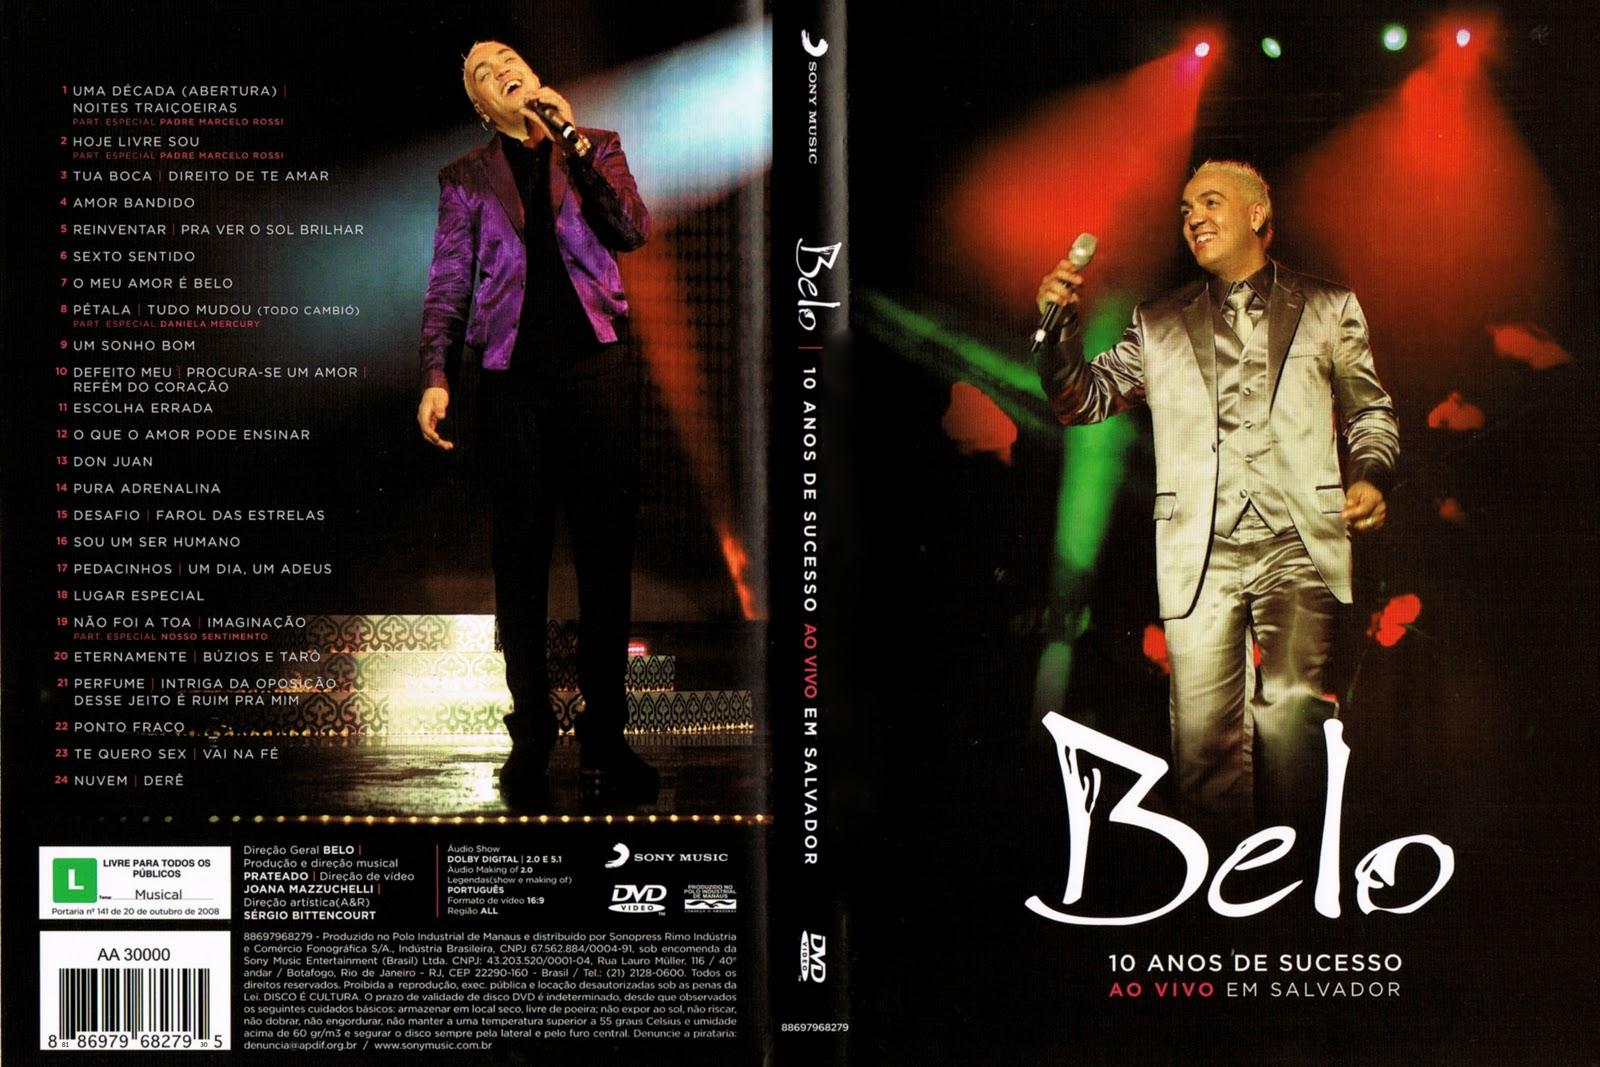 BELO SOL PRA DO VER GRATIS BRILHAR BAIXAR DVD O